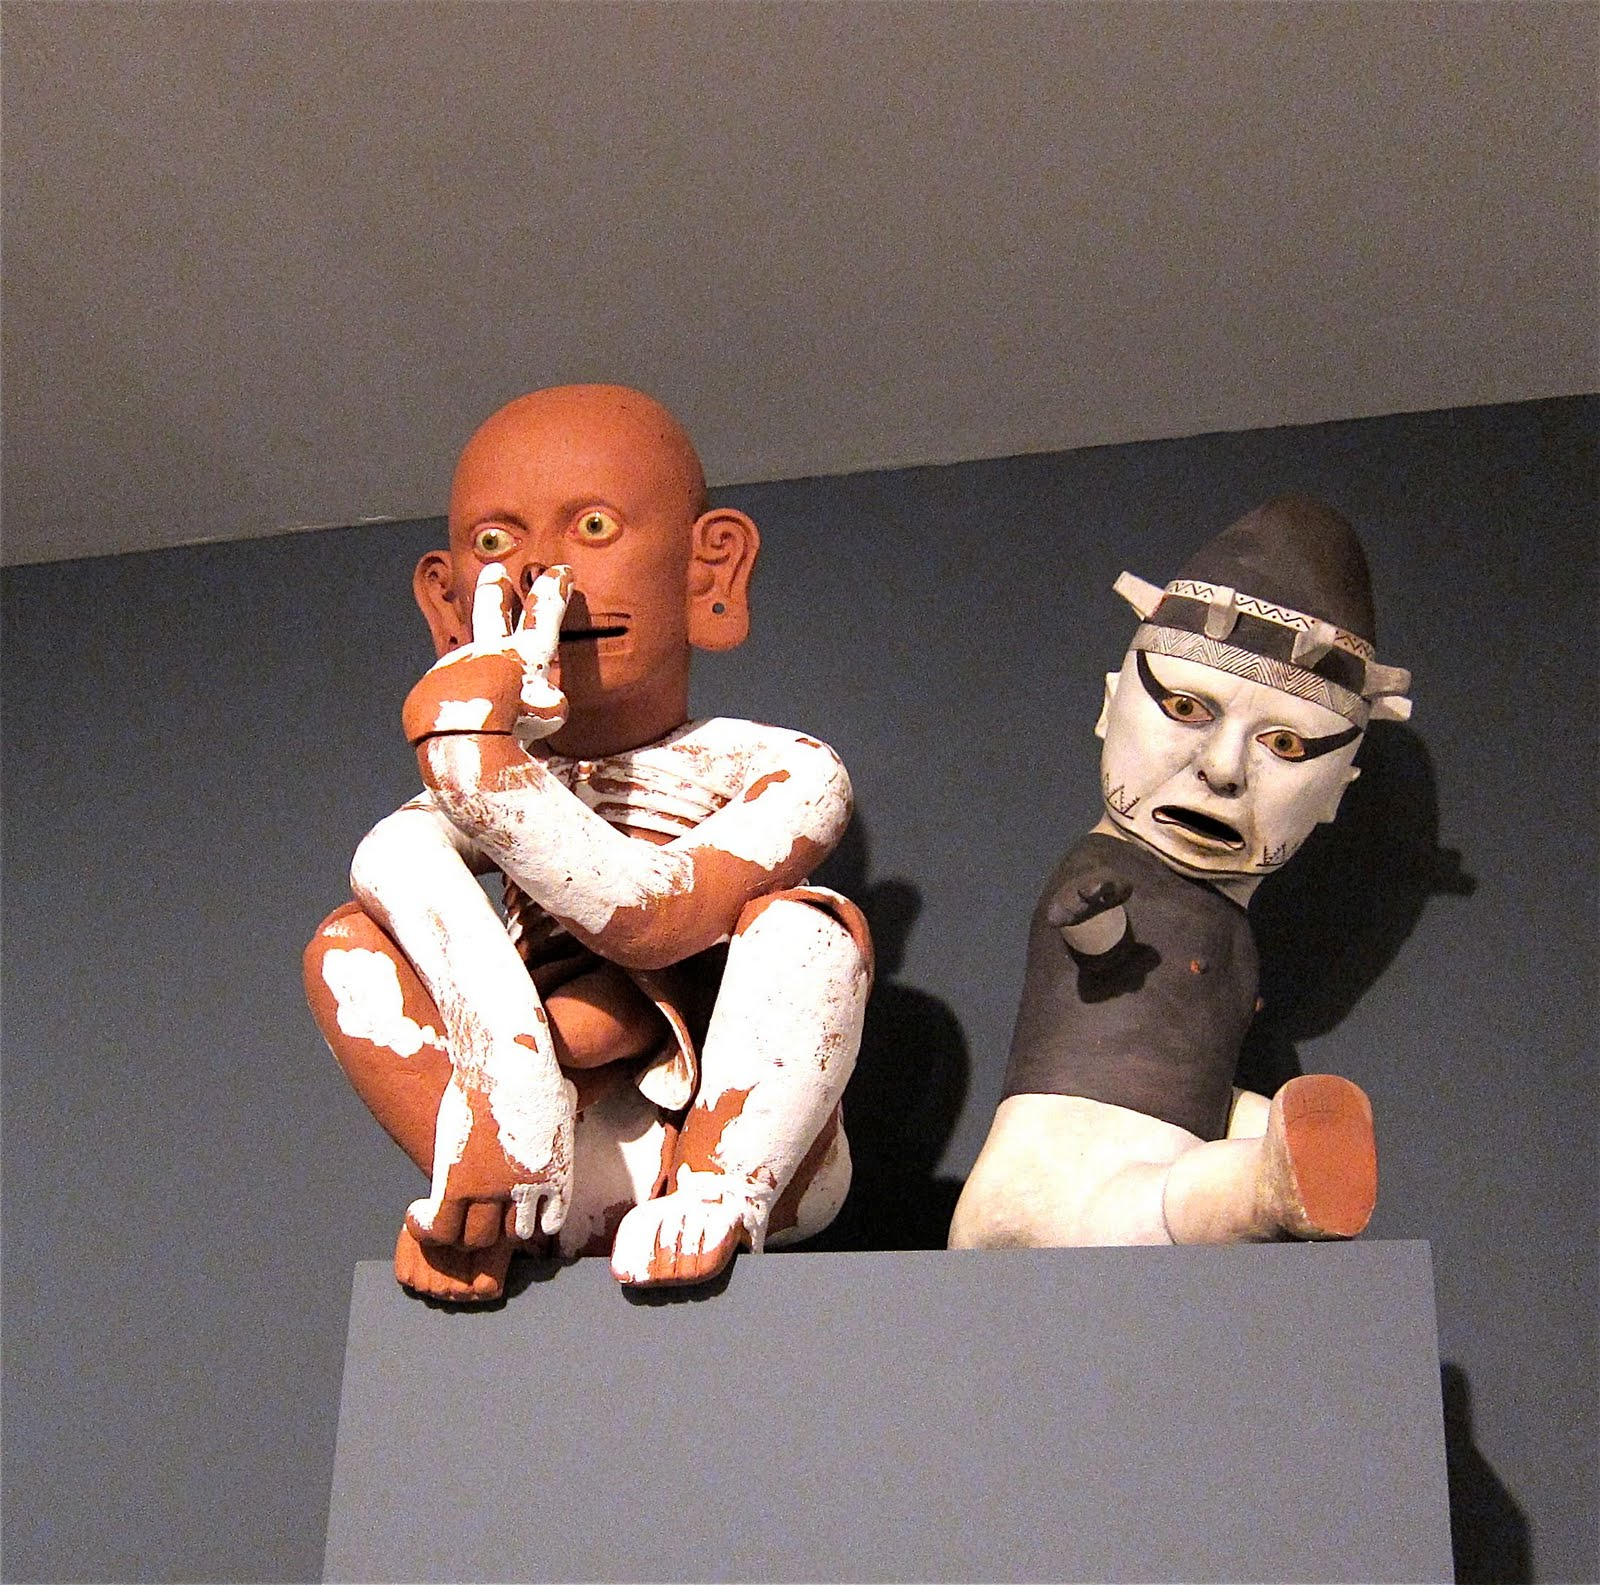 Kukuli Velarde, poeta visual